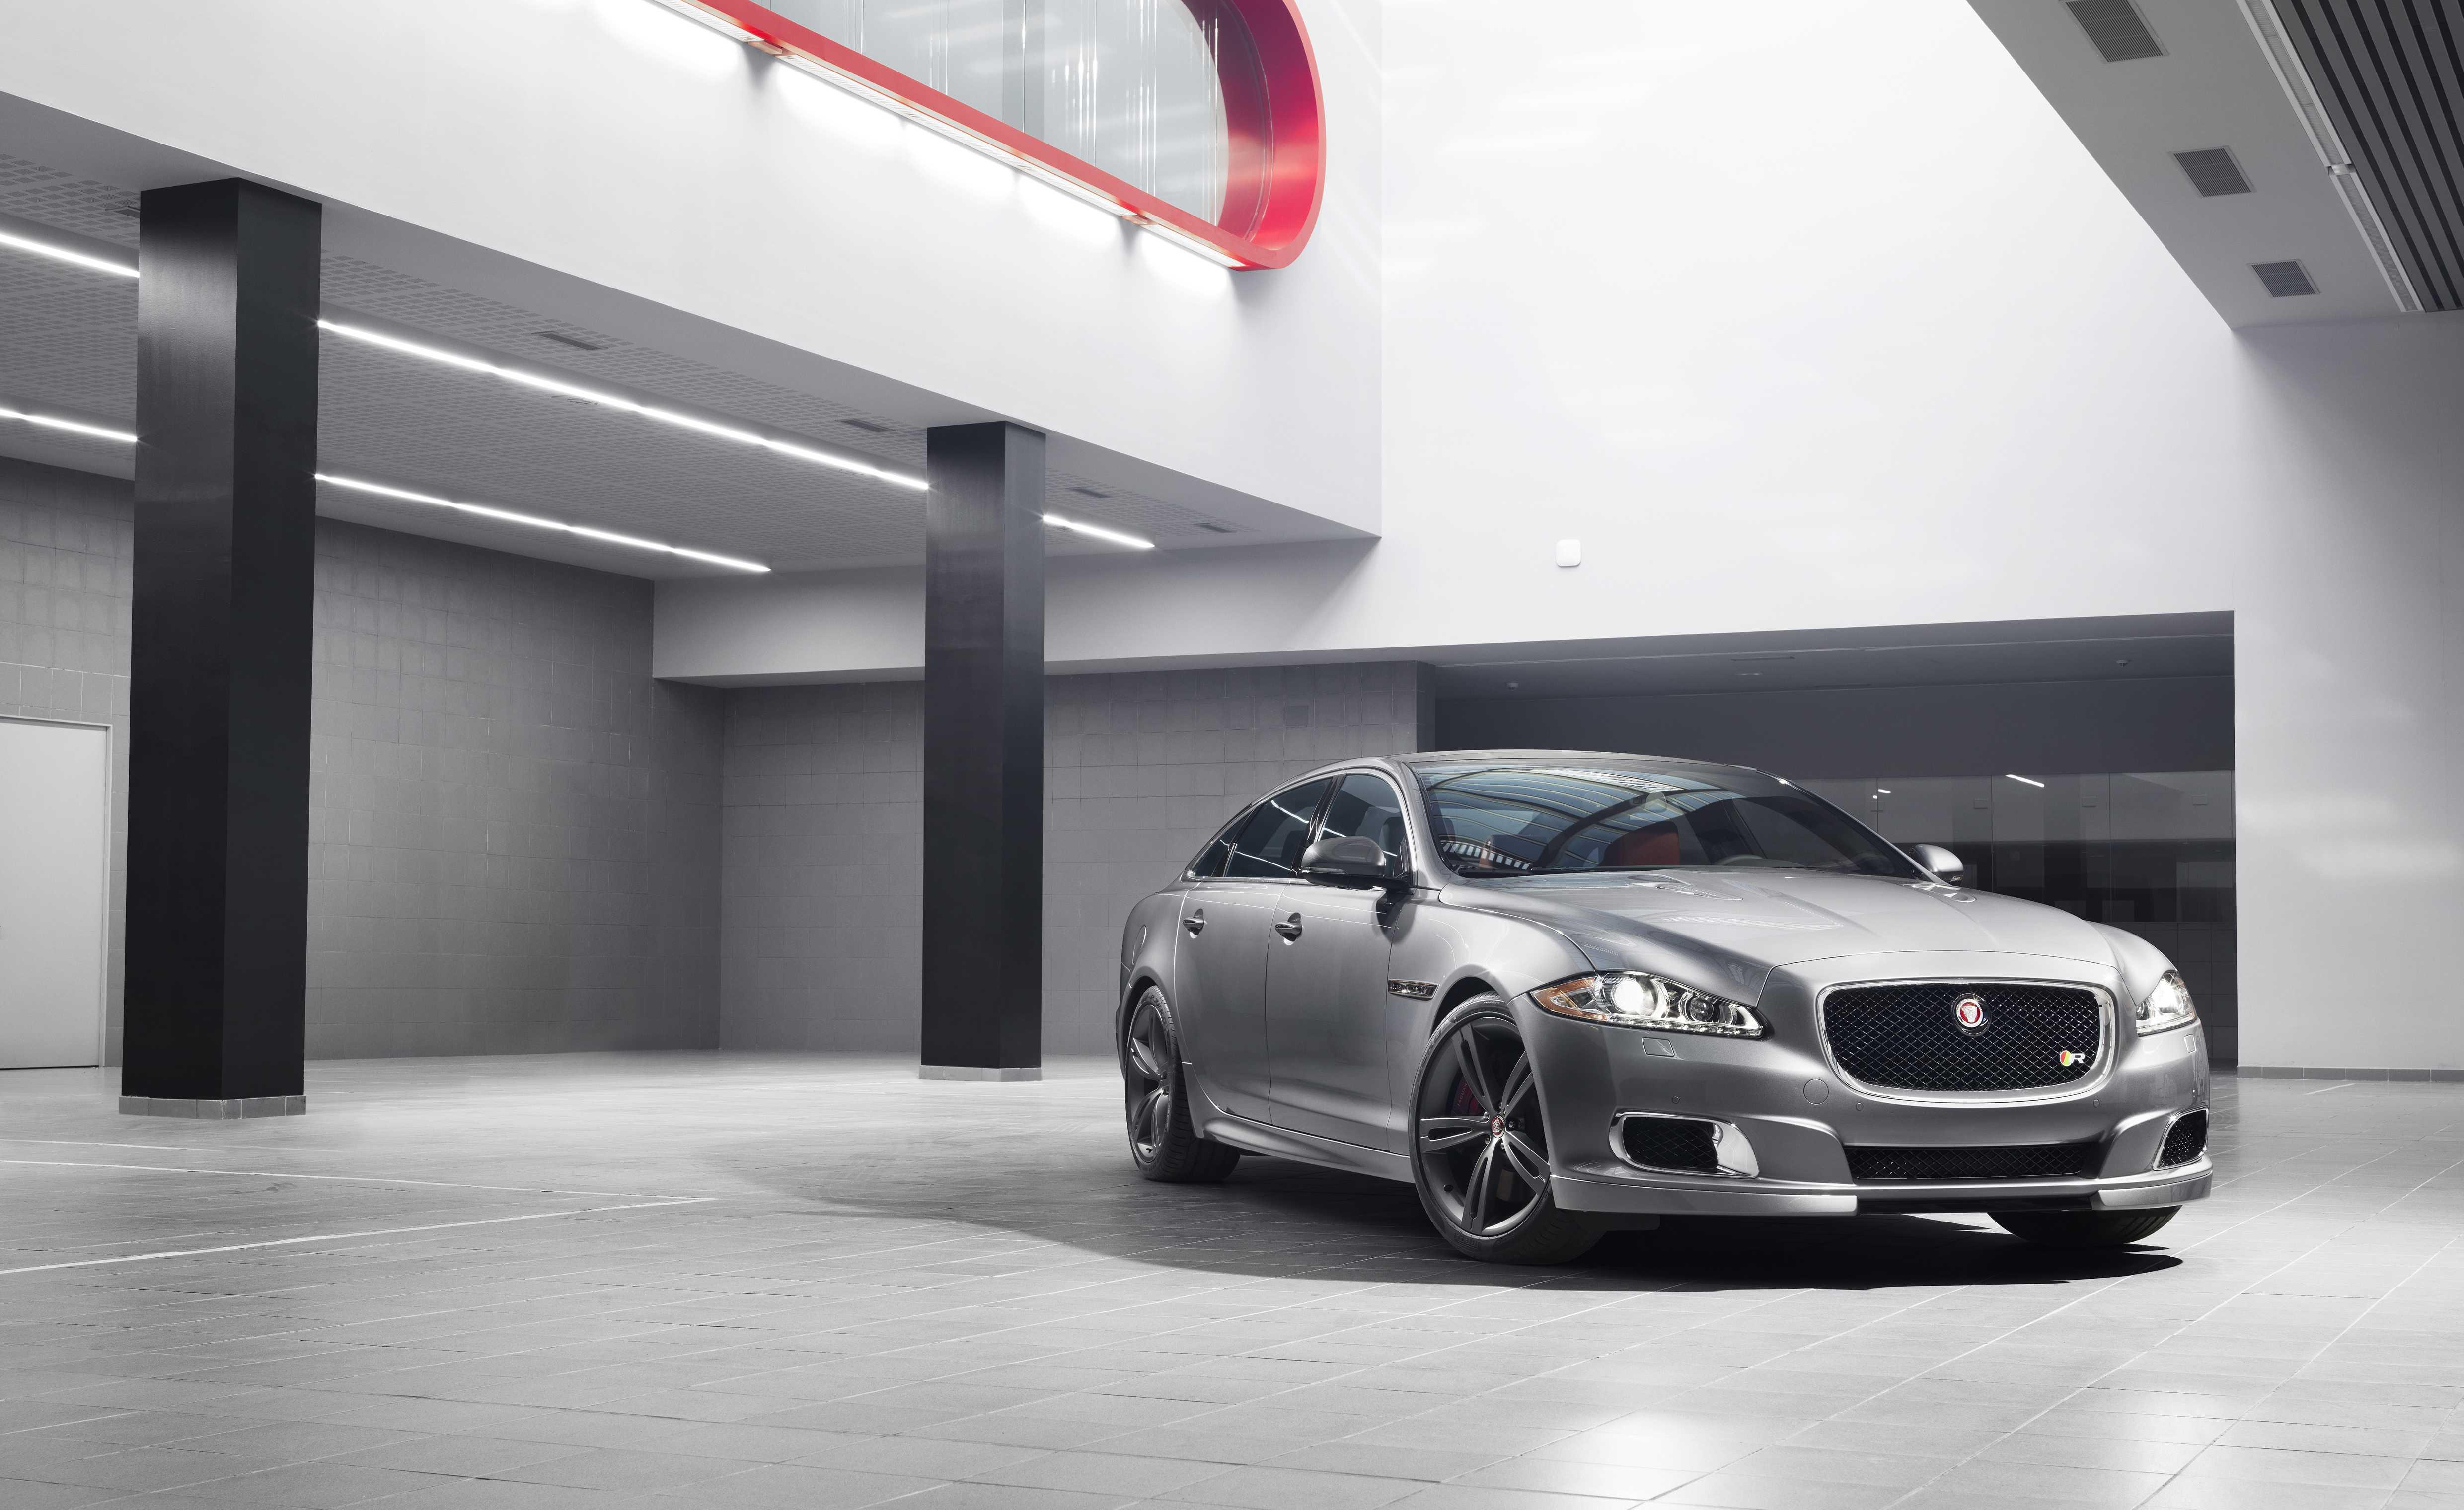 executive cars is list car future jaguar price missile the horsepower new s